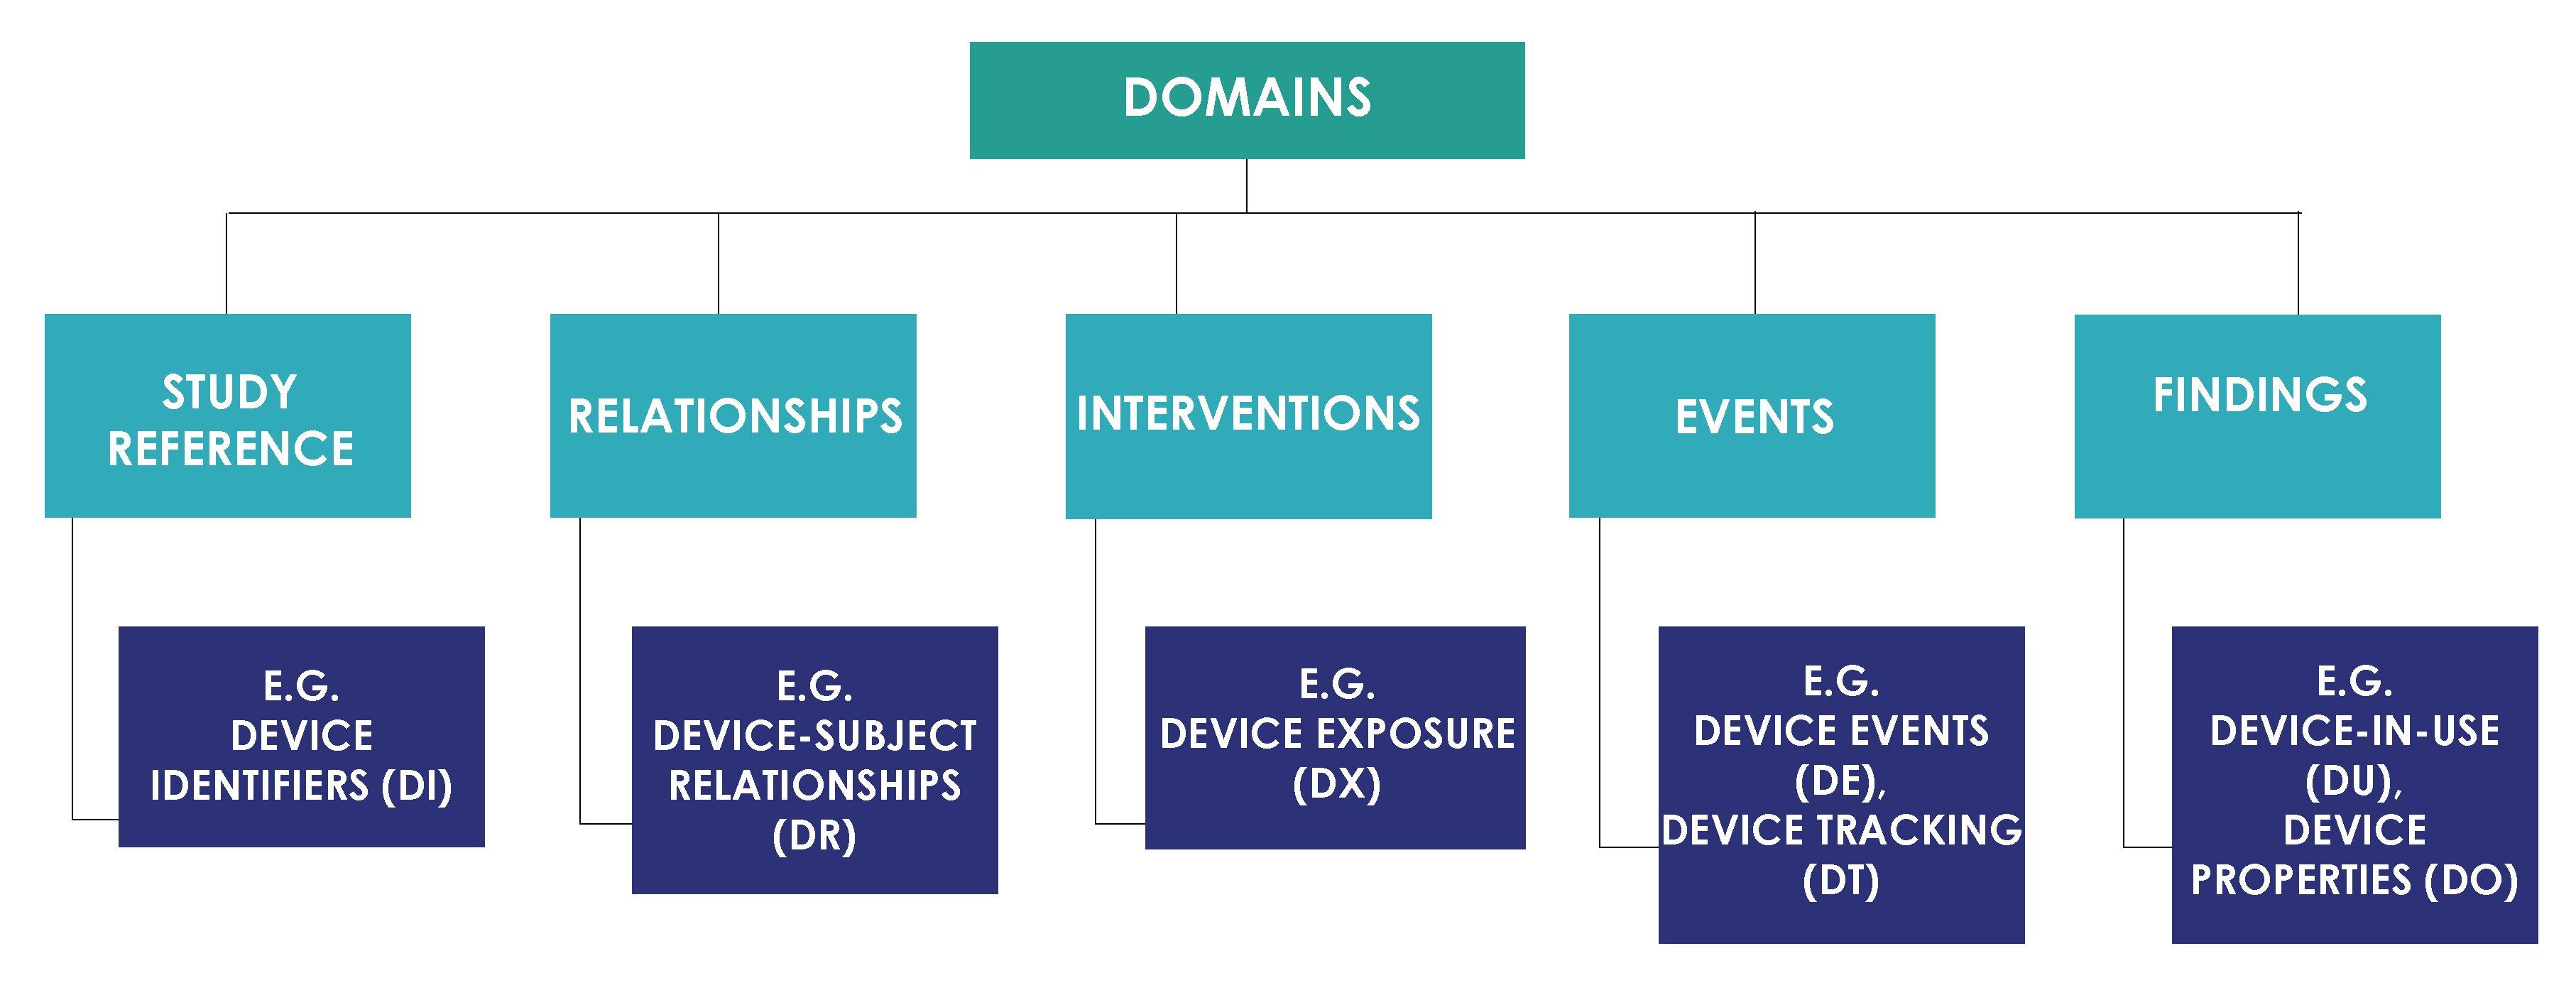 Domains per SDTMIG-MD